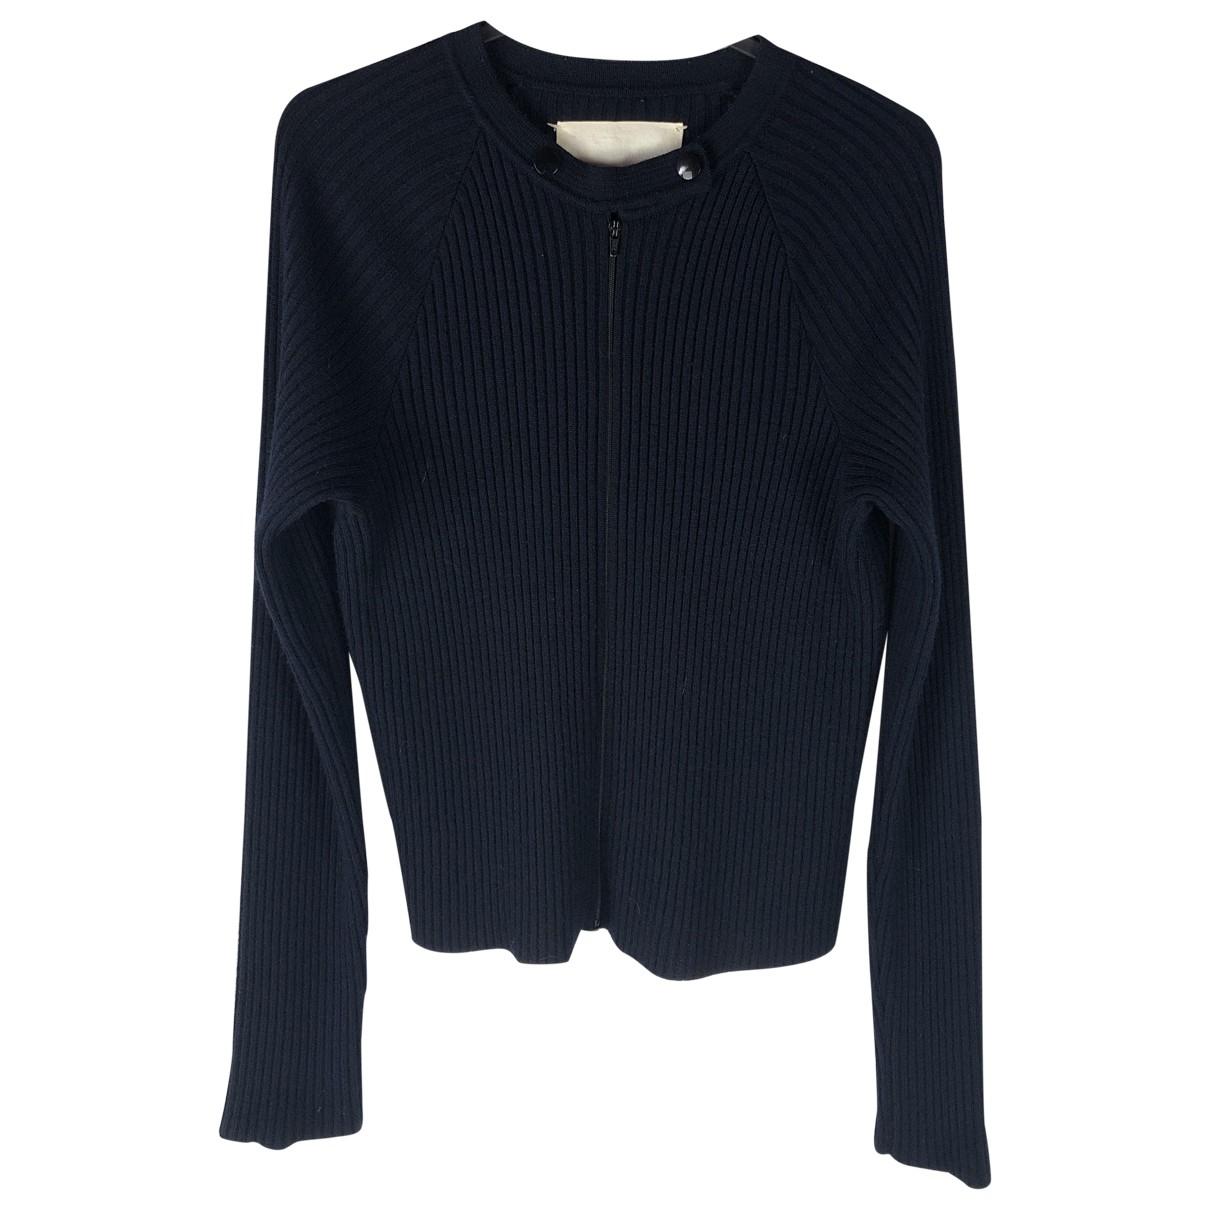 Maison Martin Margiela \N Navy Wool Knitwear for Women XL International